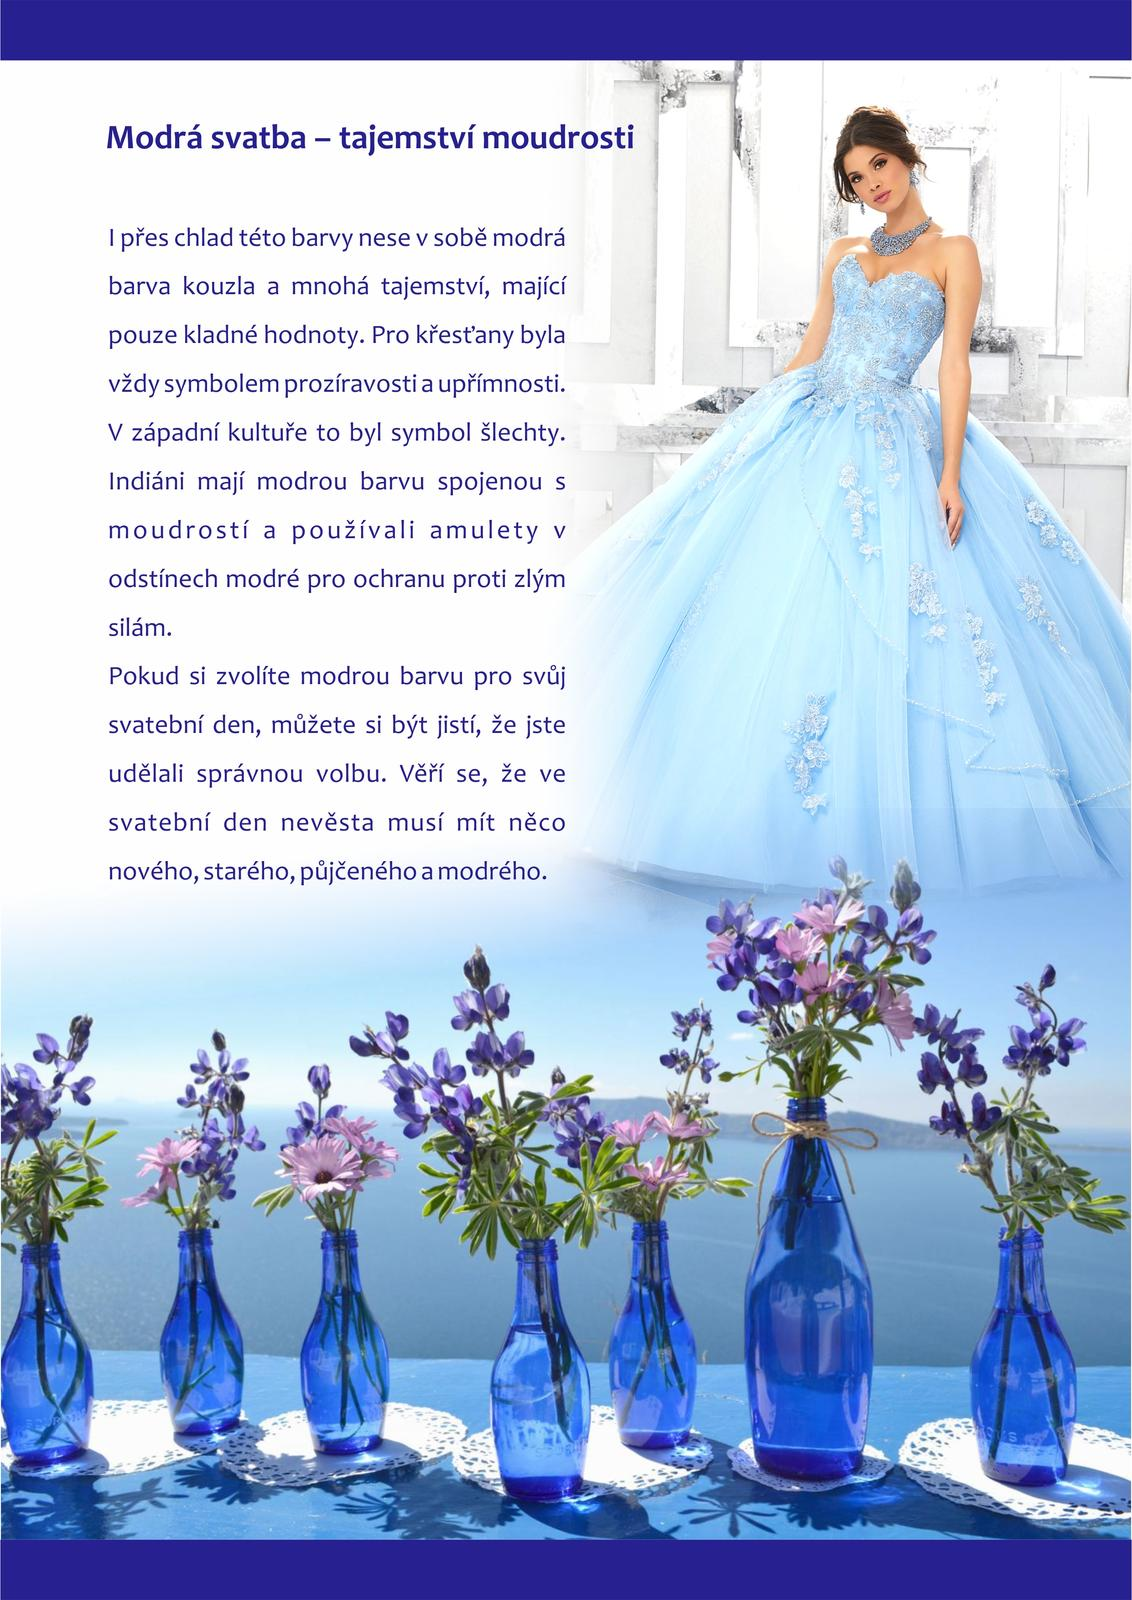 Svatebni Barva A Trendy Pro Rok 2019 Svatebn